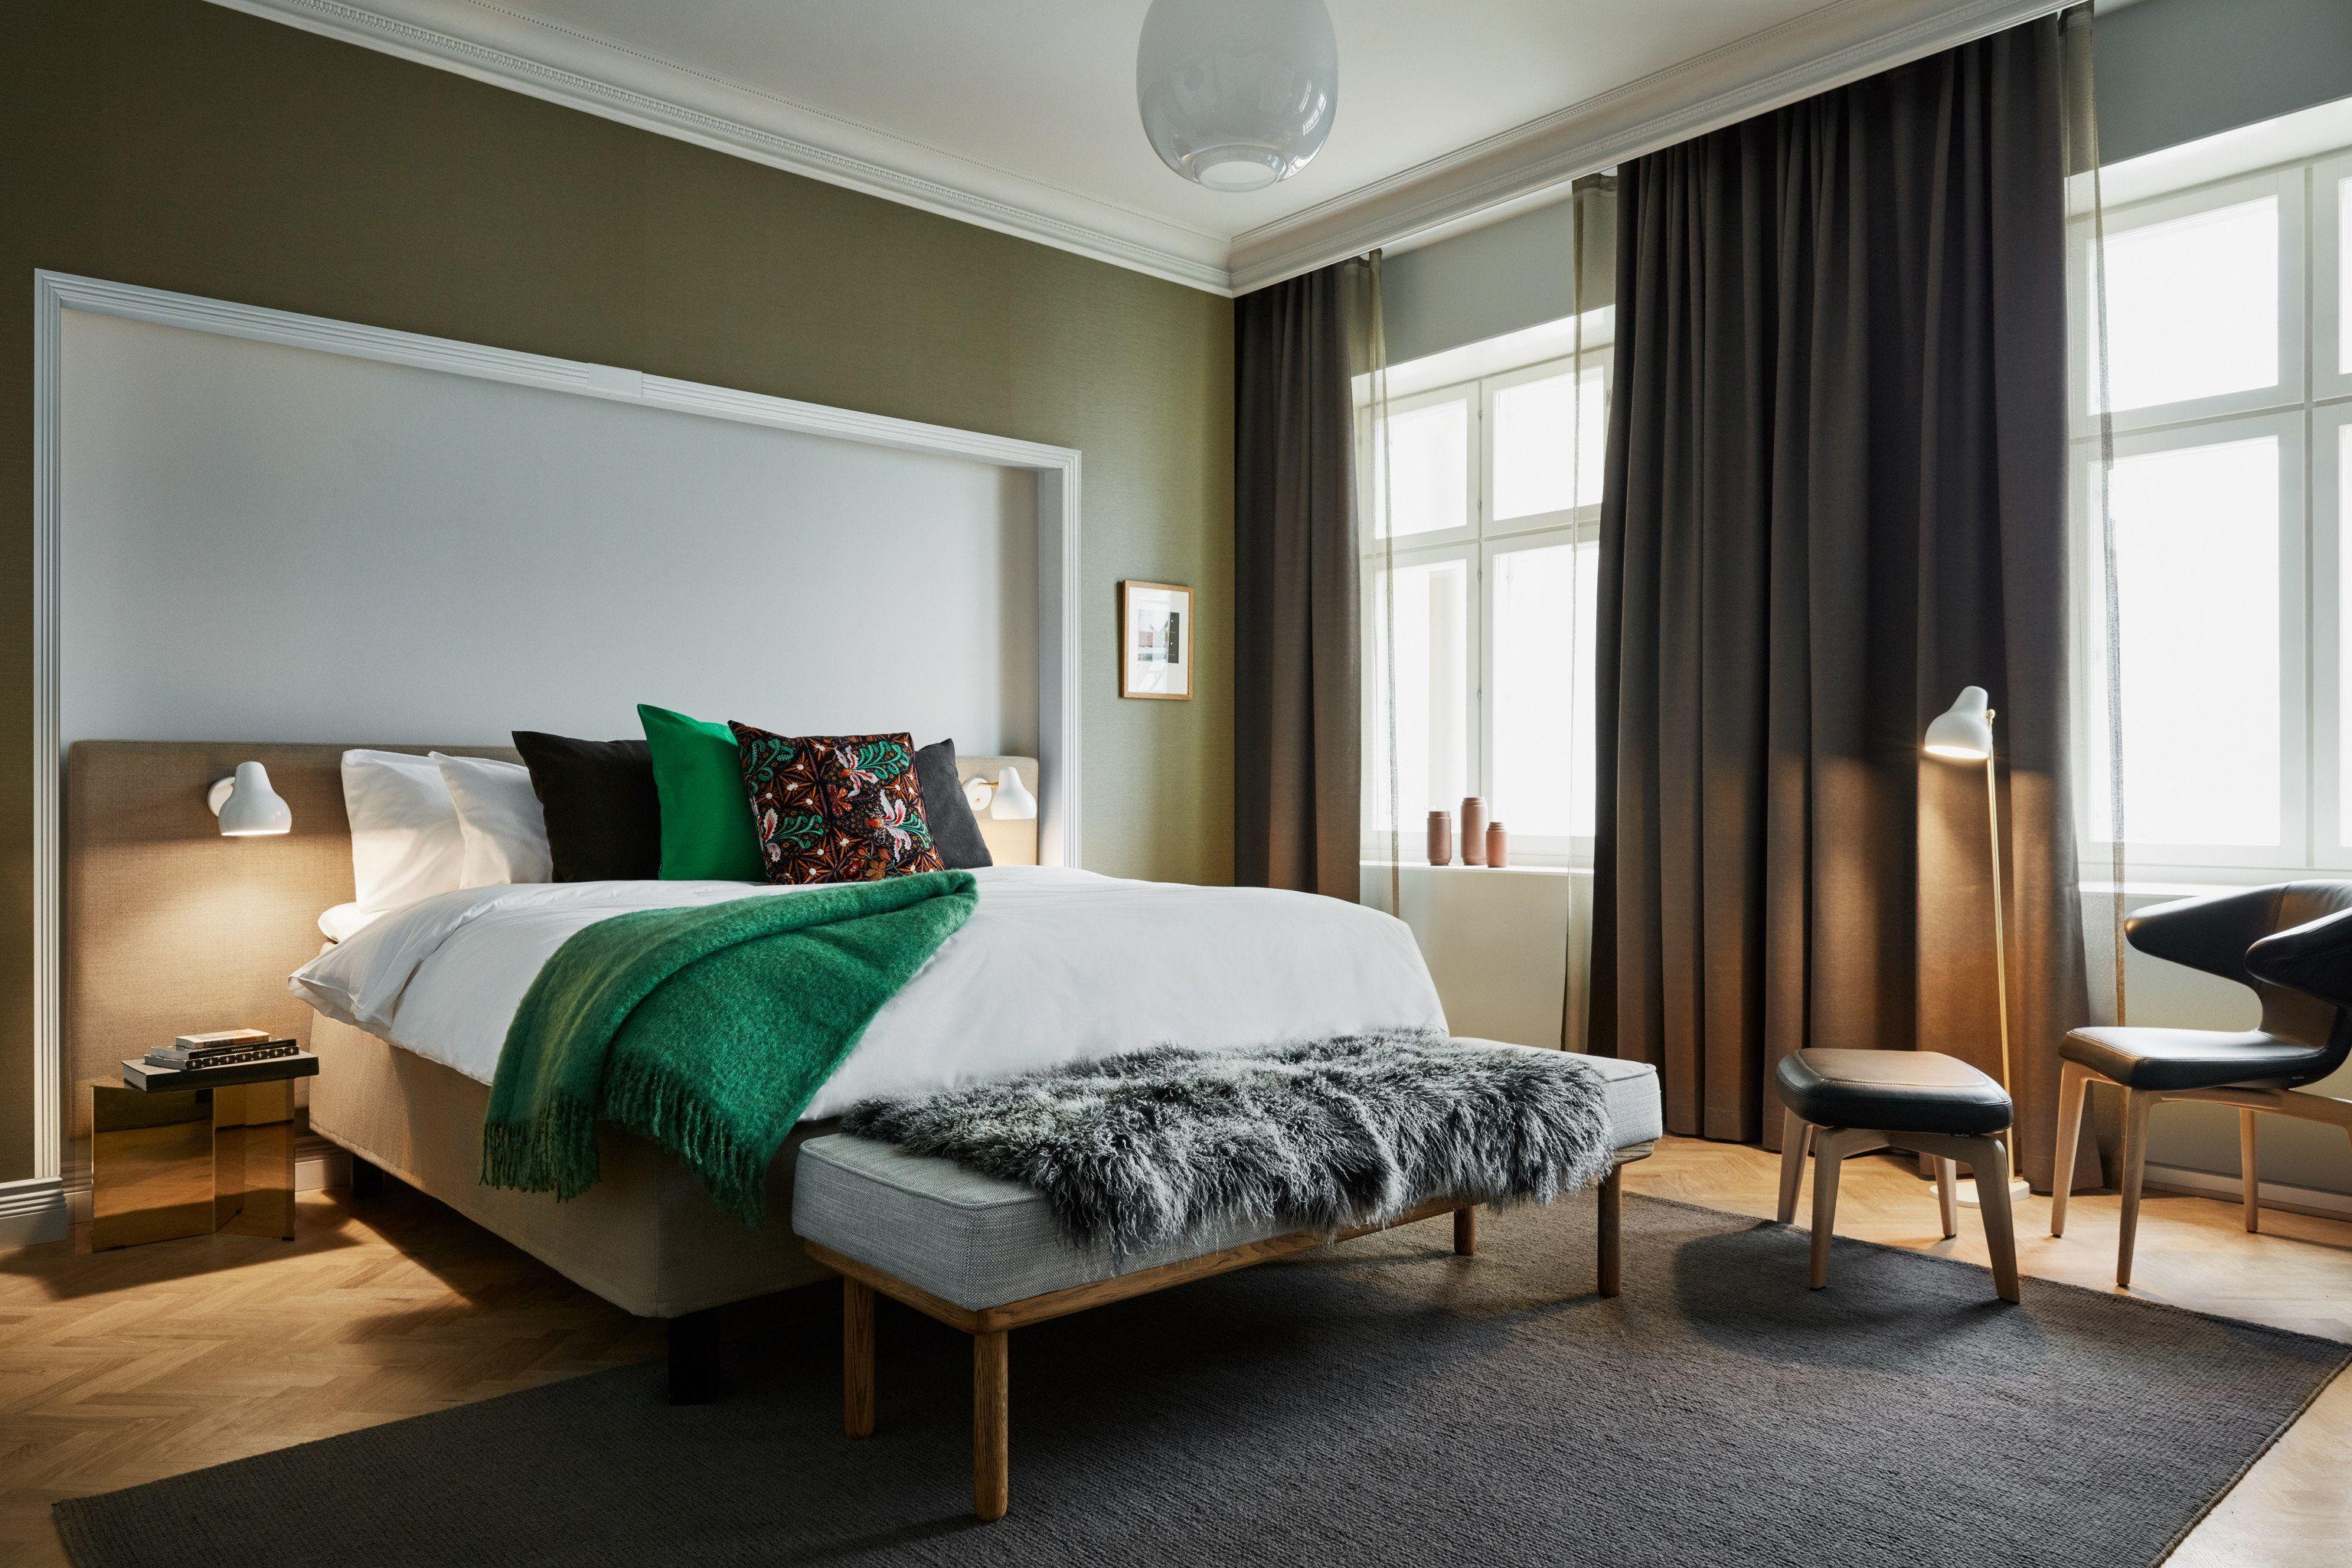 9 Scandinavian Design Hotels We Re Completely Obsessed With Jetsetter Bed Interior Hotels Design Bedroom Design